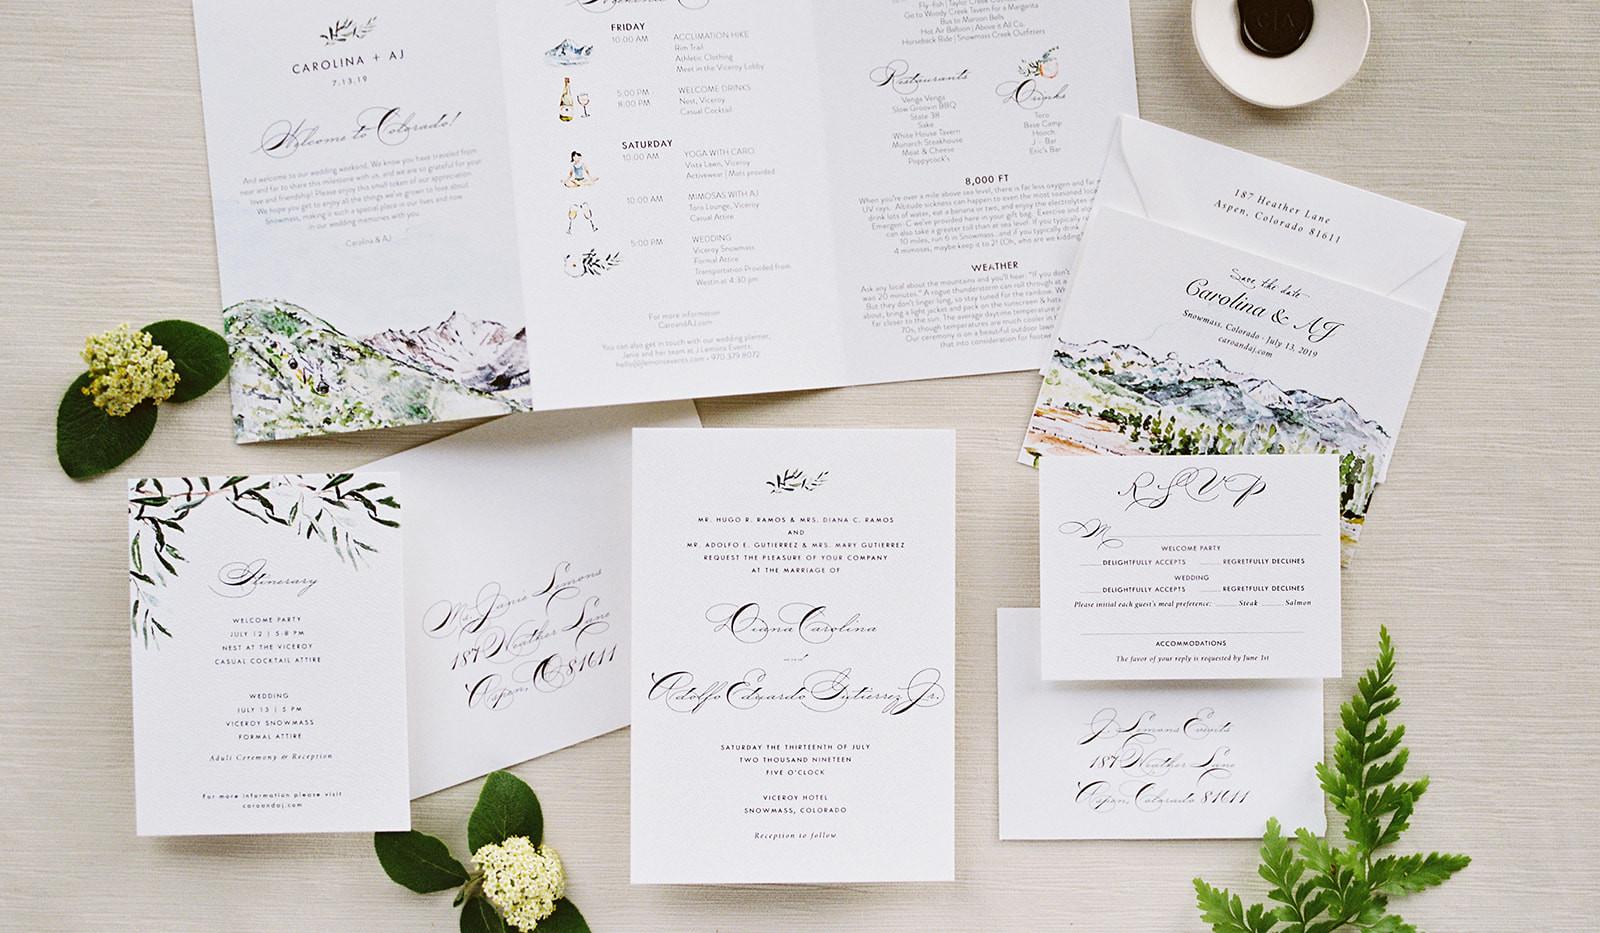 TBP_Carolina_AJ_Wedding_0170.jpg